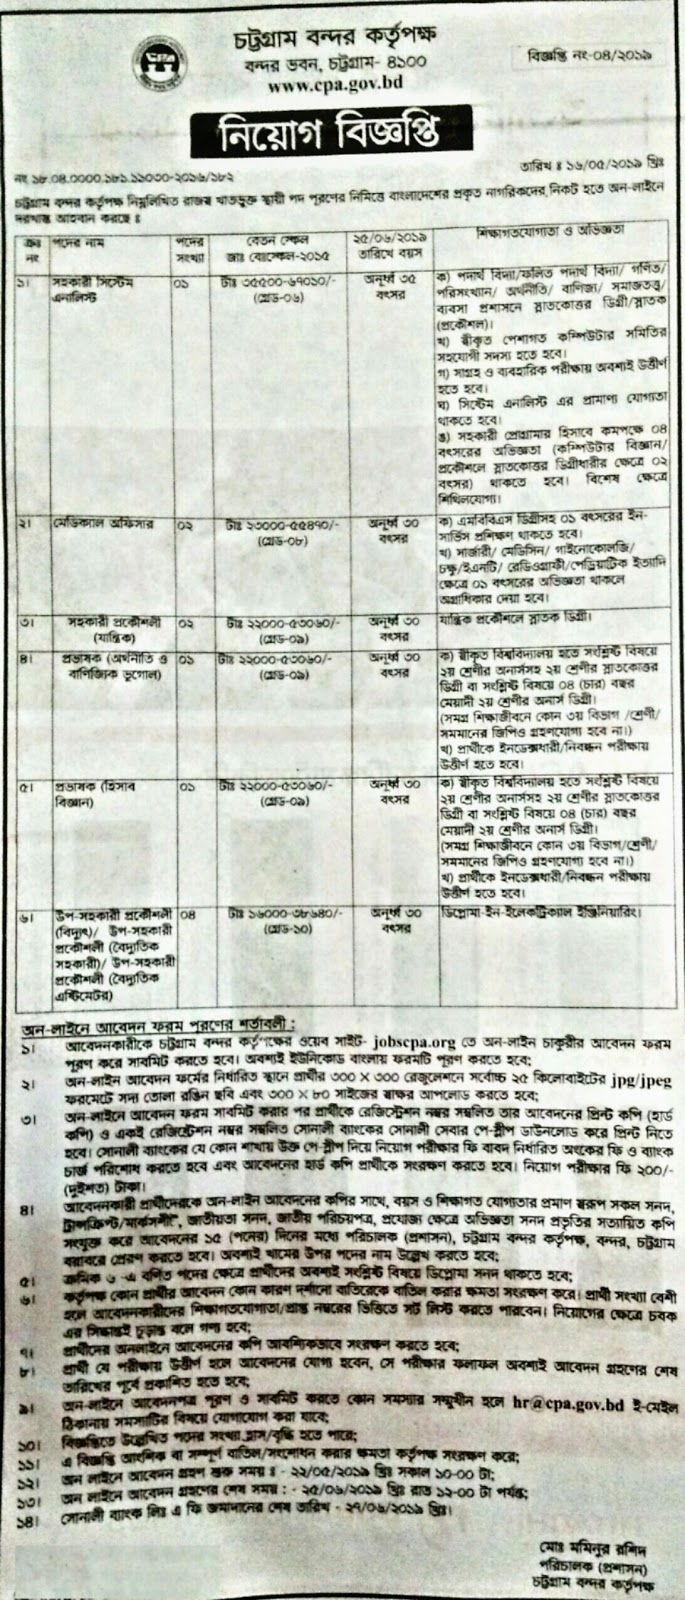 Chittagong Port Authority new job circular 2019. চট্রগ্রাম বন্দর কতৃপক্ষ নতুন নিয়োগ বিজ্ঞপ্তি ২০১৯